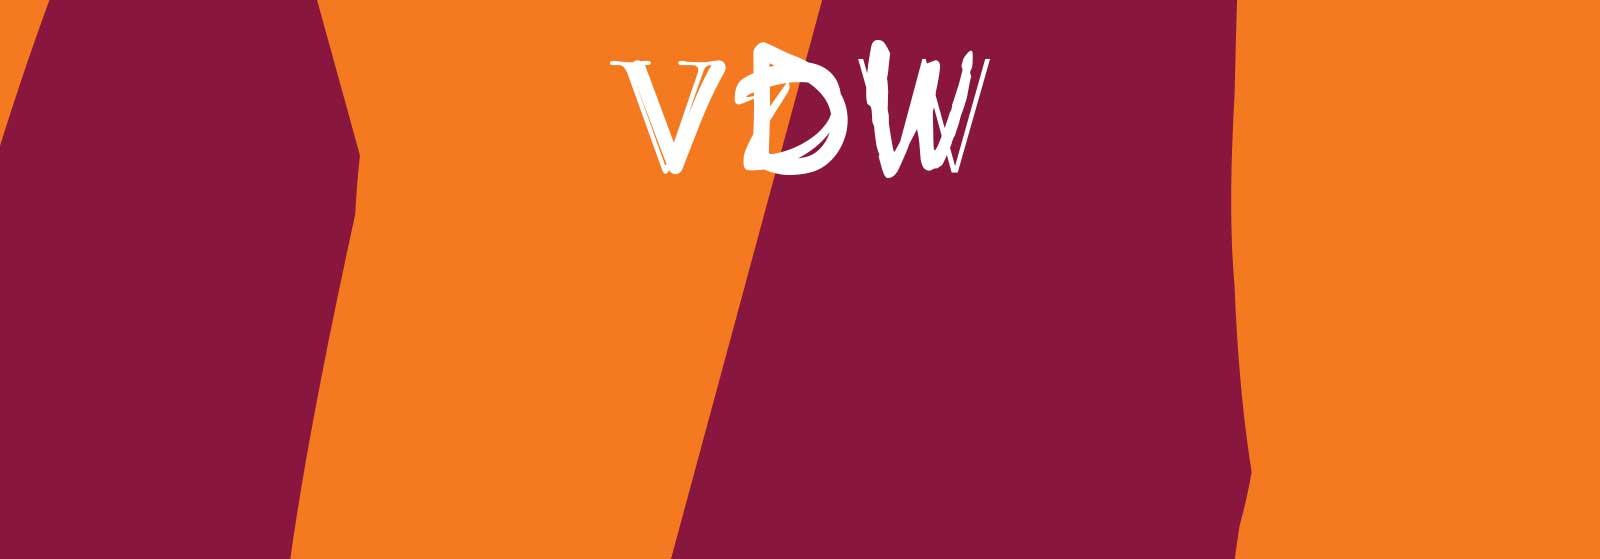 VDW_header2